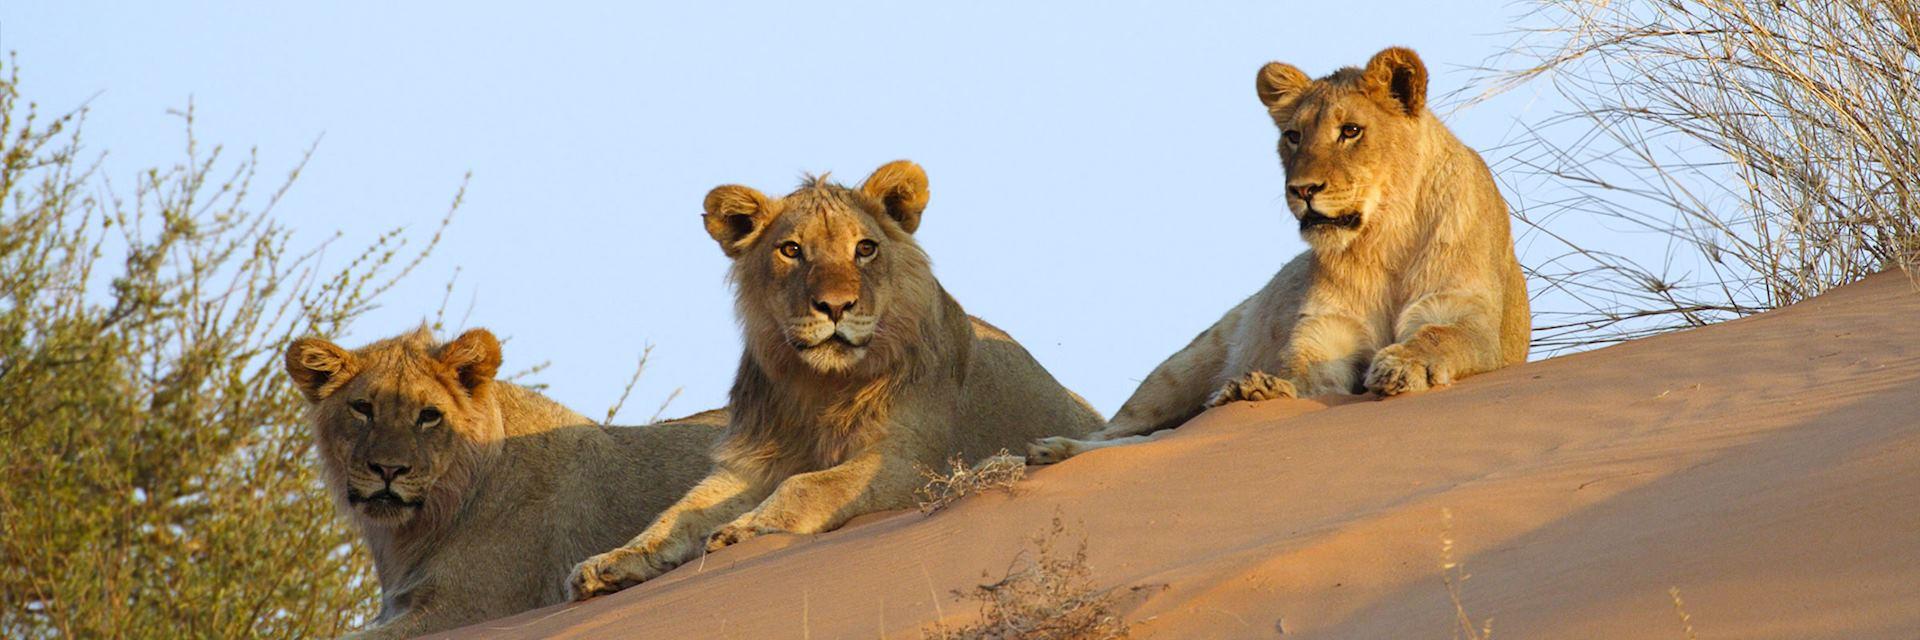 Lion on a Kalahari sand dune, Botswana